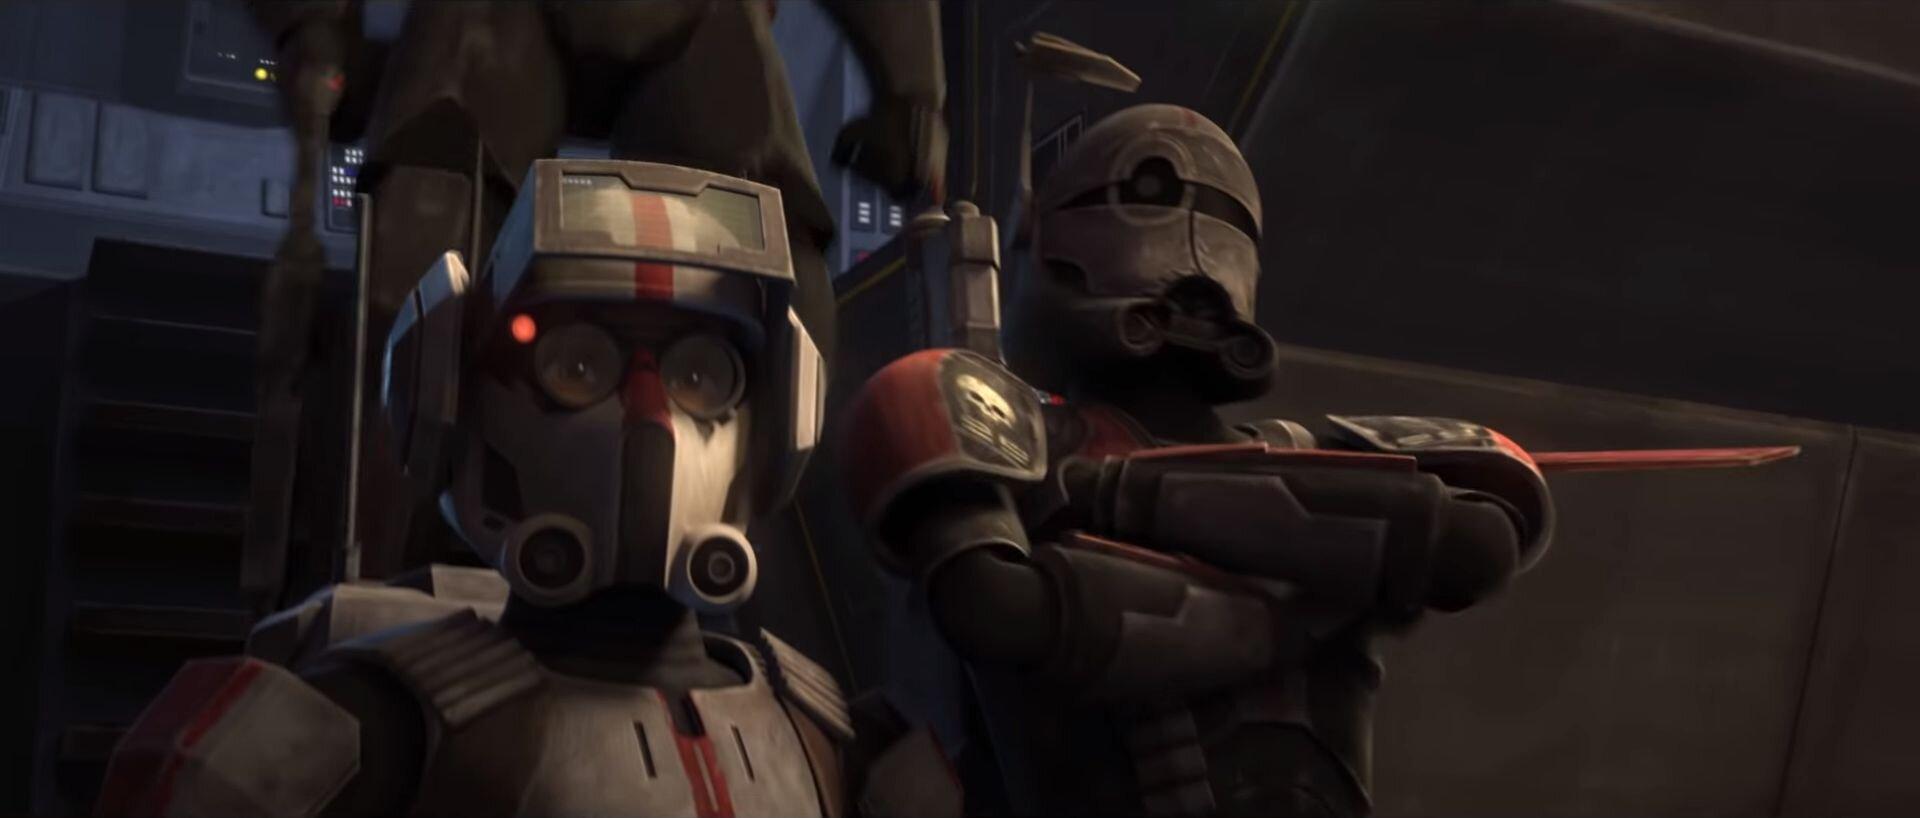 Honest Trailers Tackles The Beloved Star Wars Clone Wars 2003 Animated Series Geektyrant